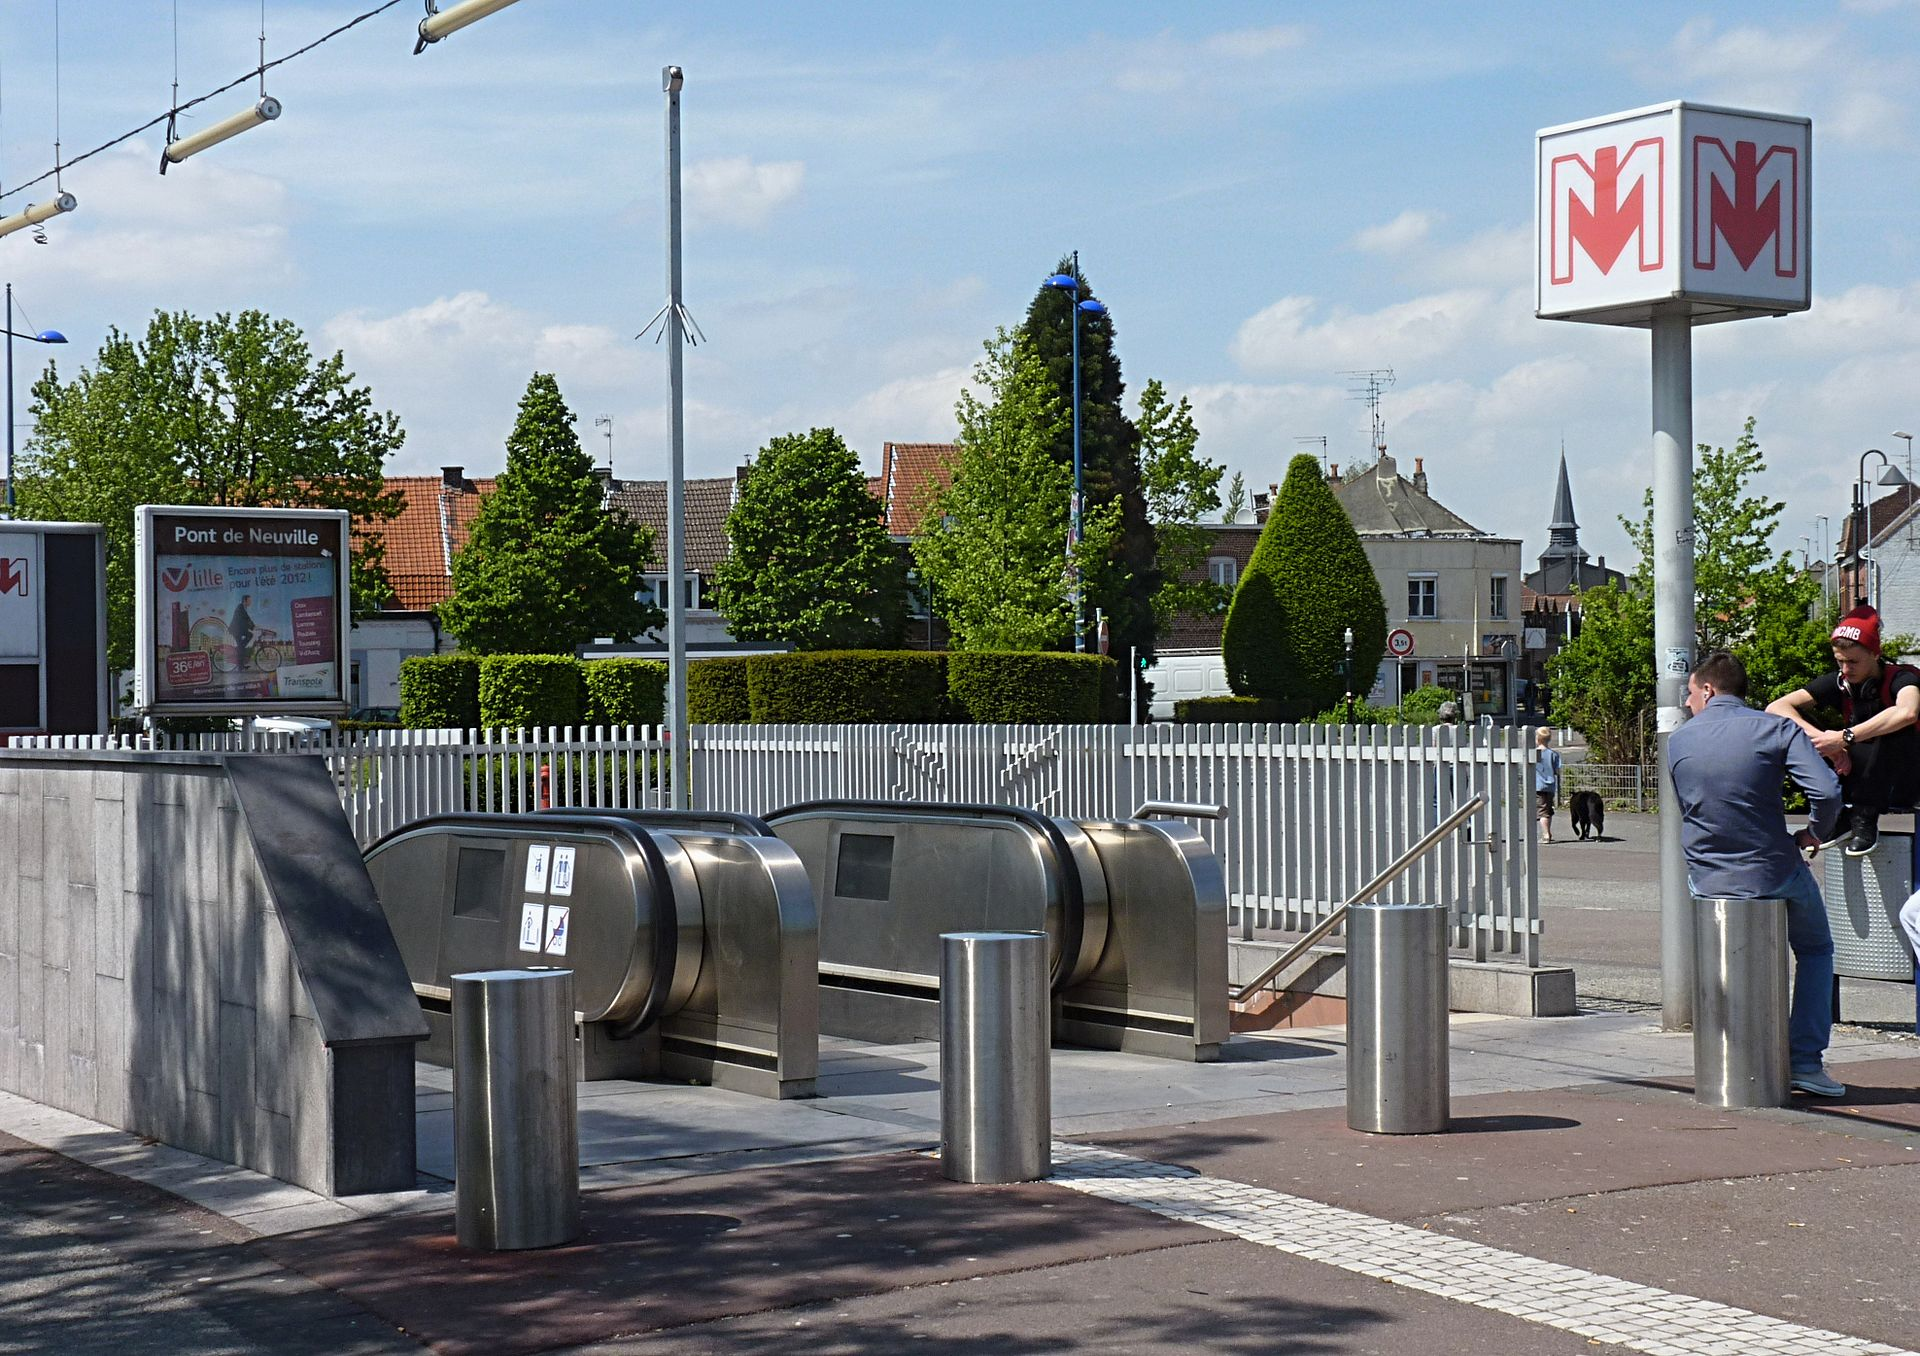 Pont de neuville metrostation wikipedia - Station essence porte des postes lille ...